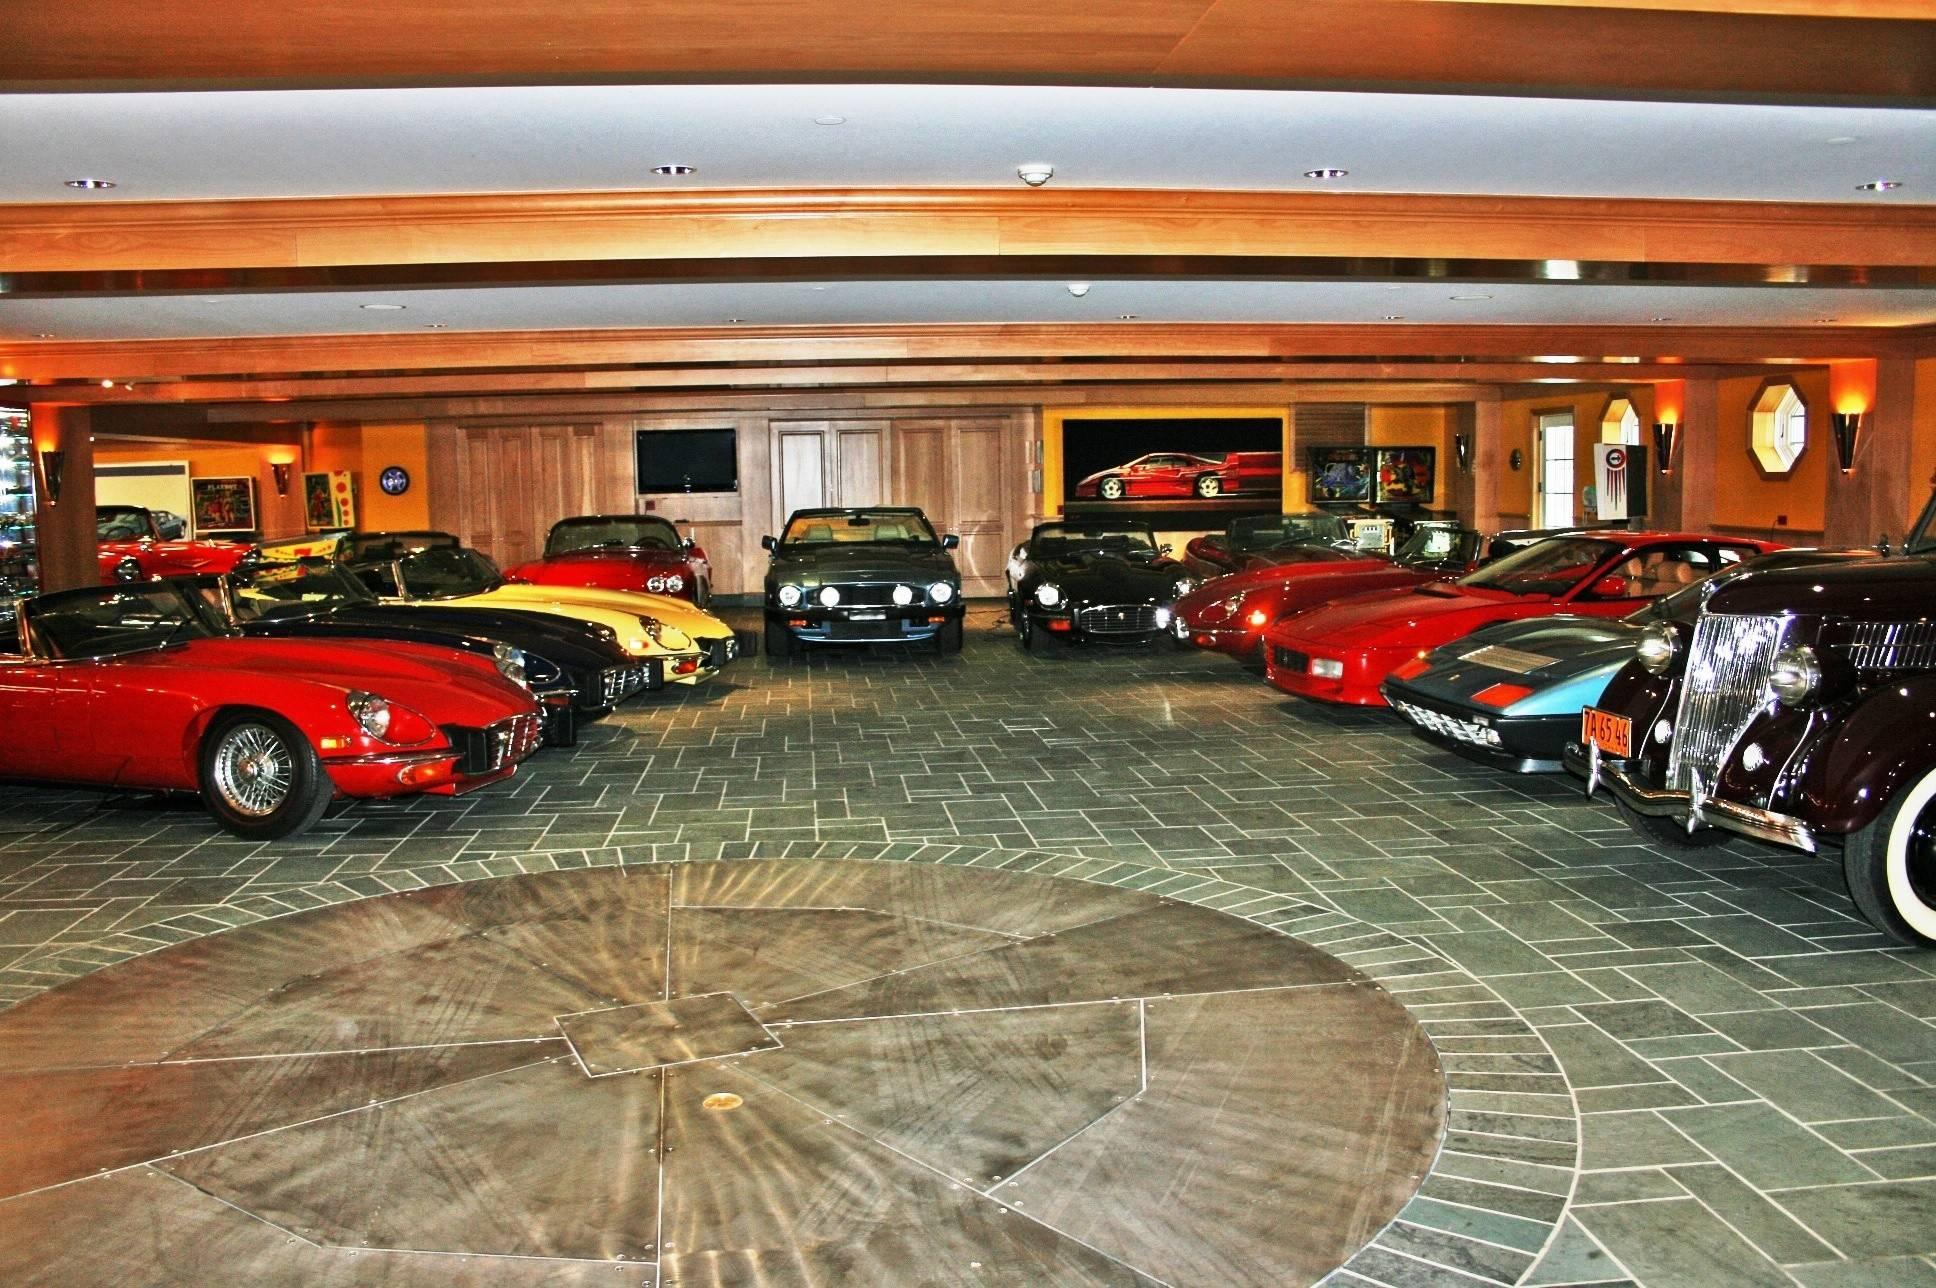 100 large garage designs garage designs interior ideas collector car garage plans collector car garage plans download